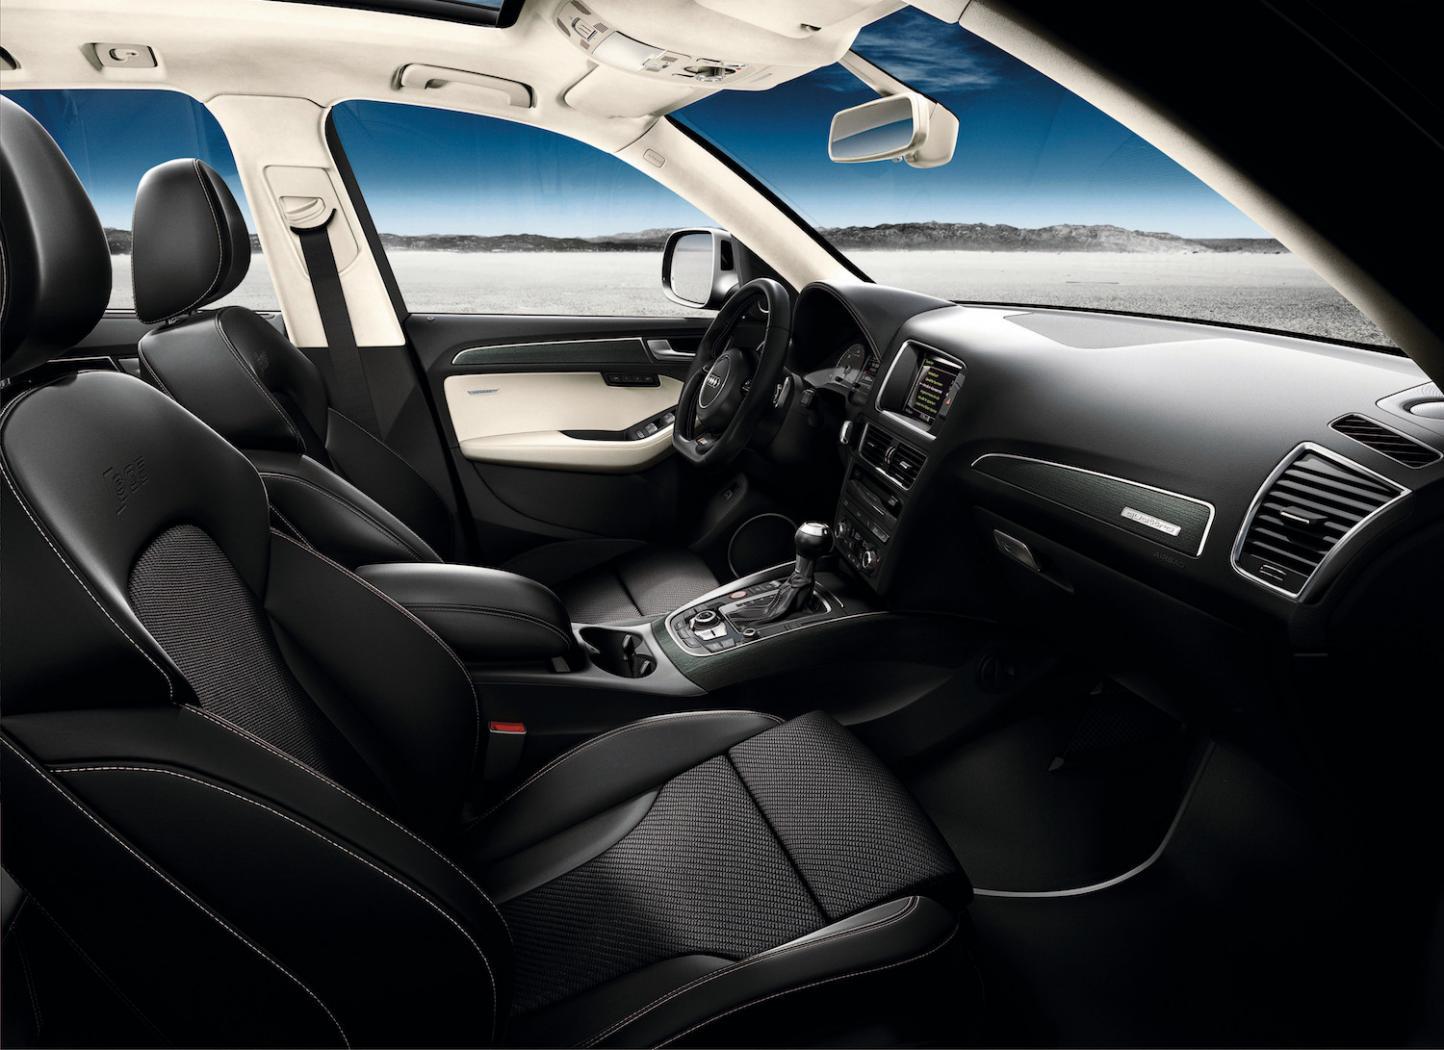 Audi-SQ5-Fiche-occasion-5.jpeg